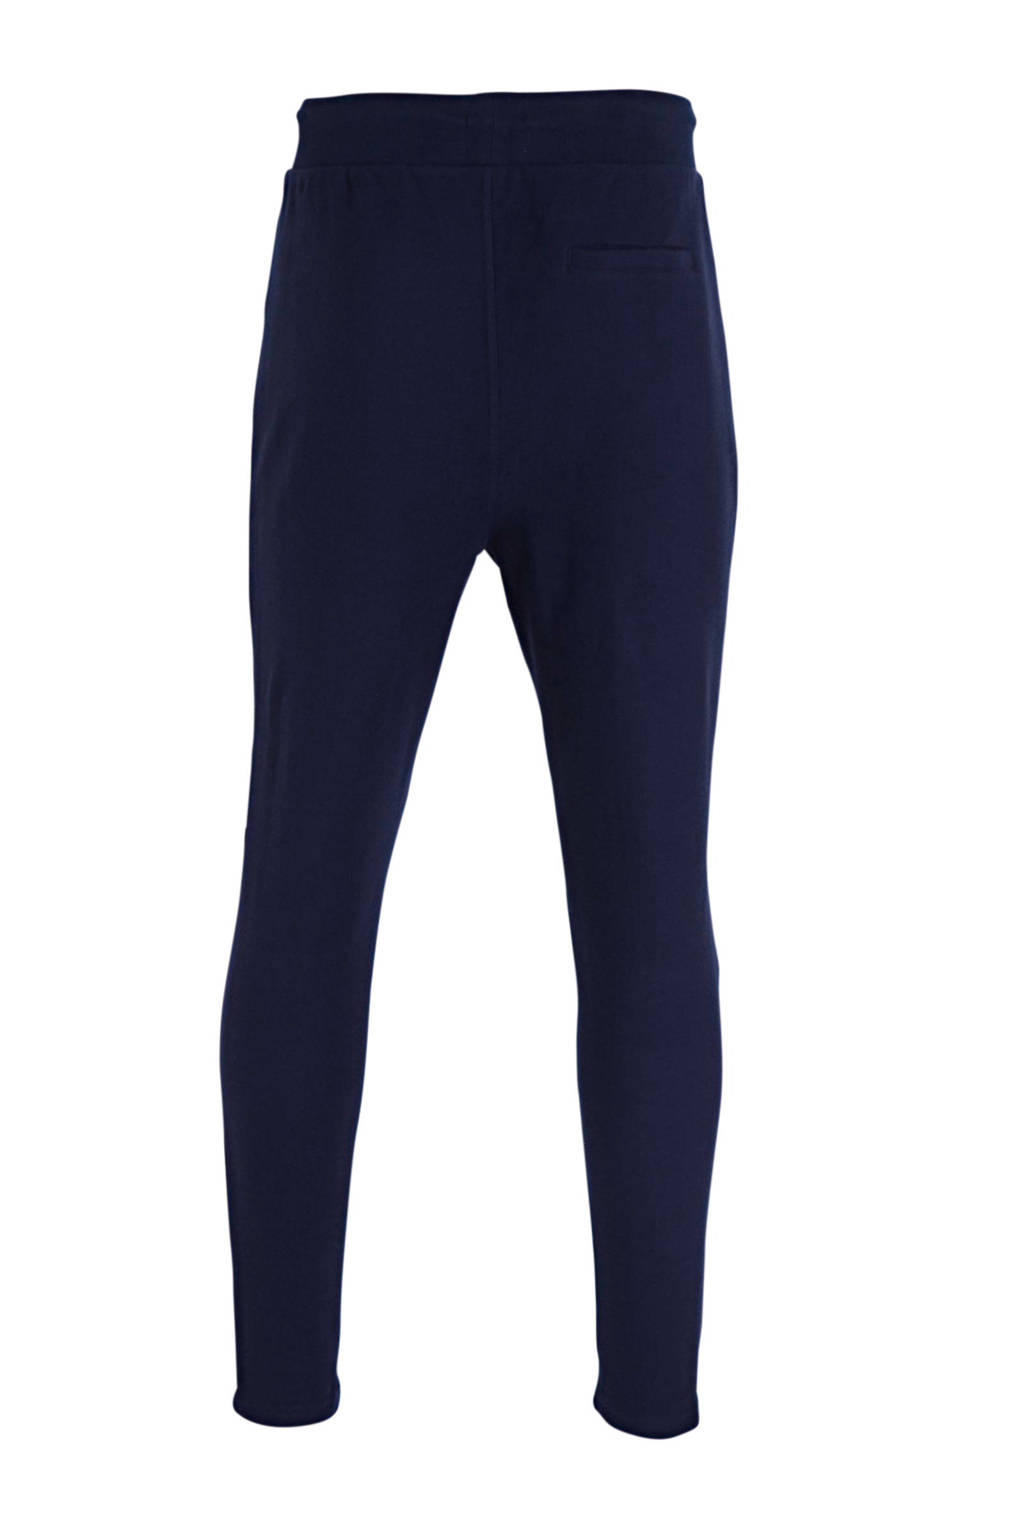 C&A Angelo Litrico slim fit joggingbroek donkerblauw, Donkerblauw